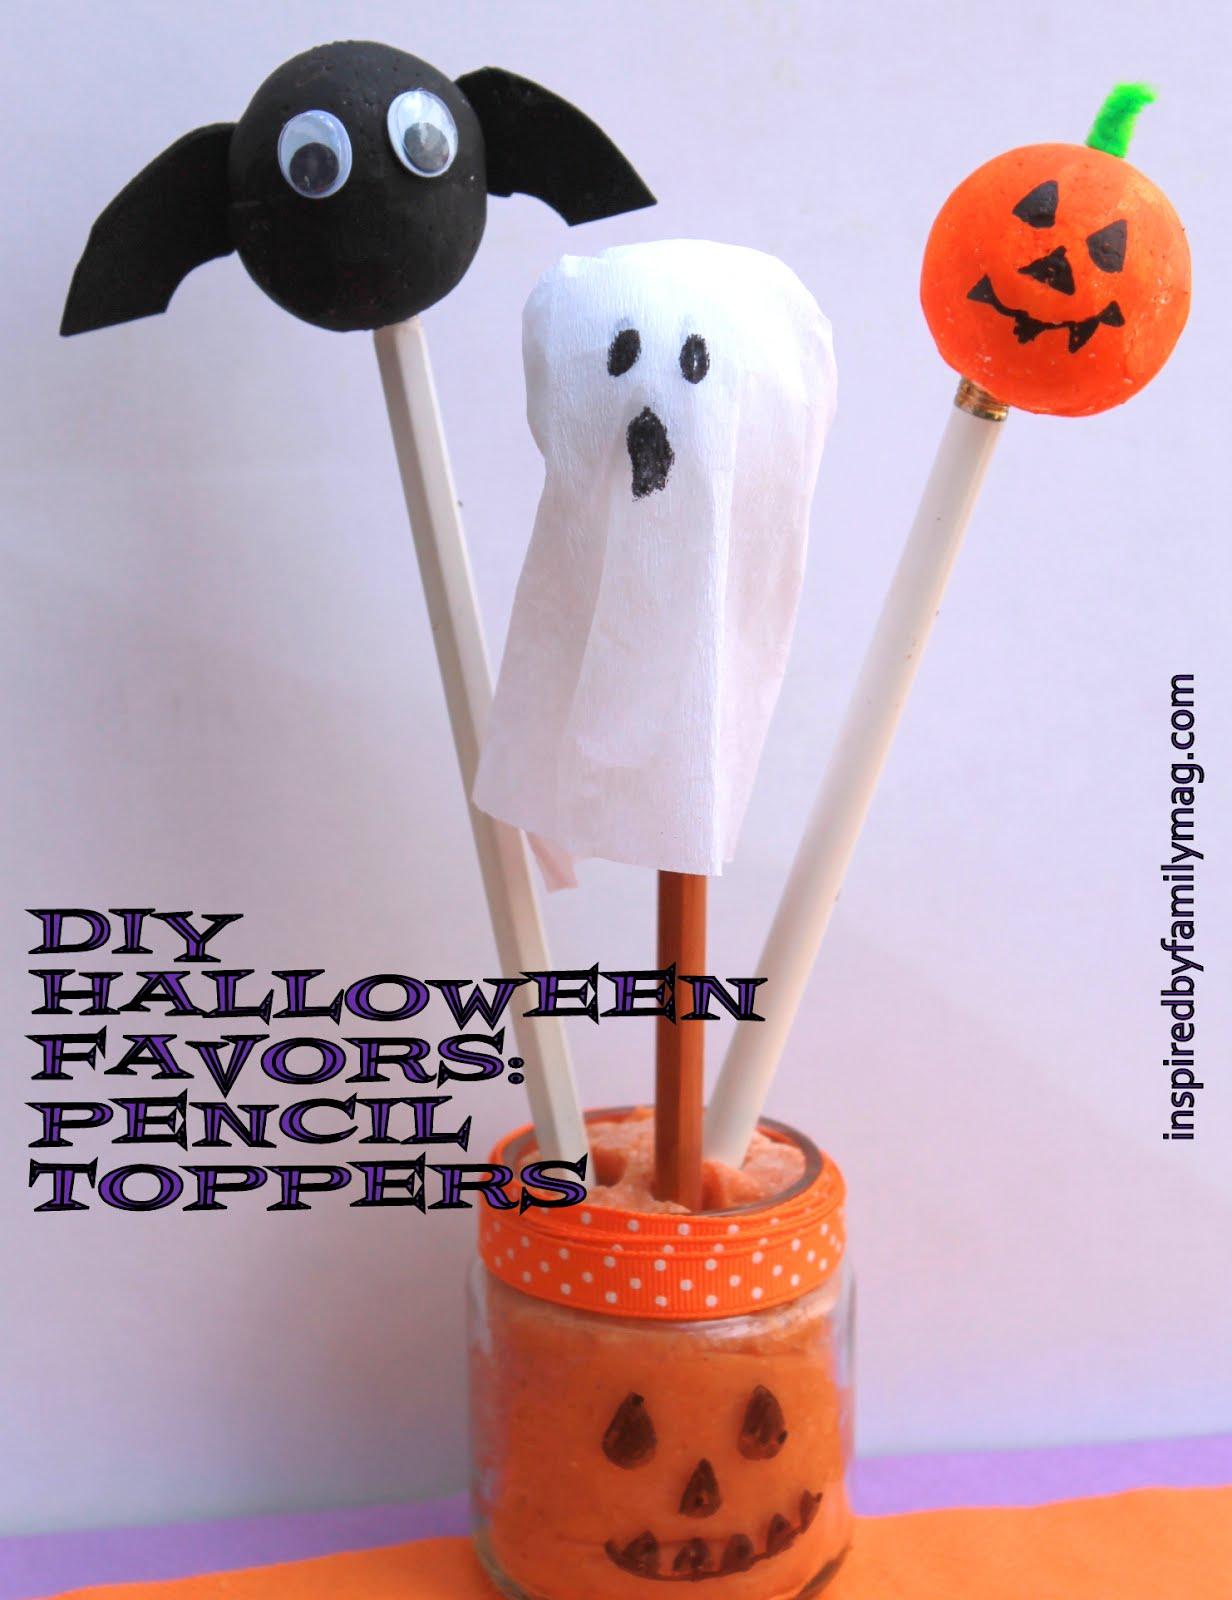 diy halloween favors pumpkin bat ghost pencil toppers - Diy Halloween Favors